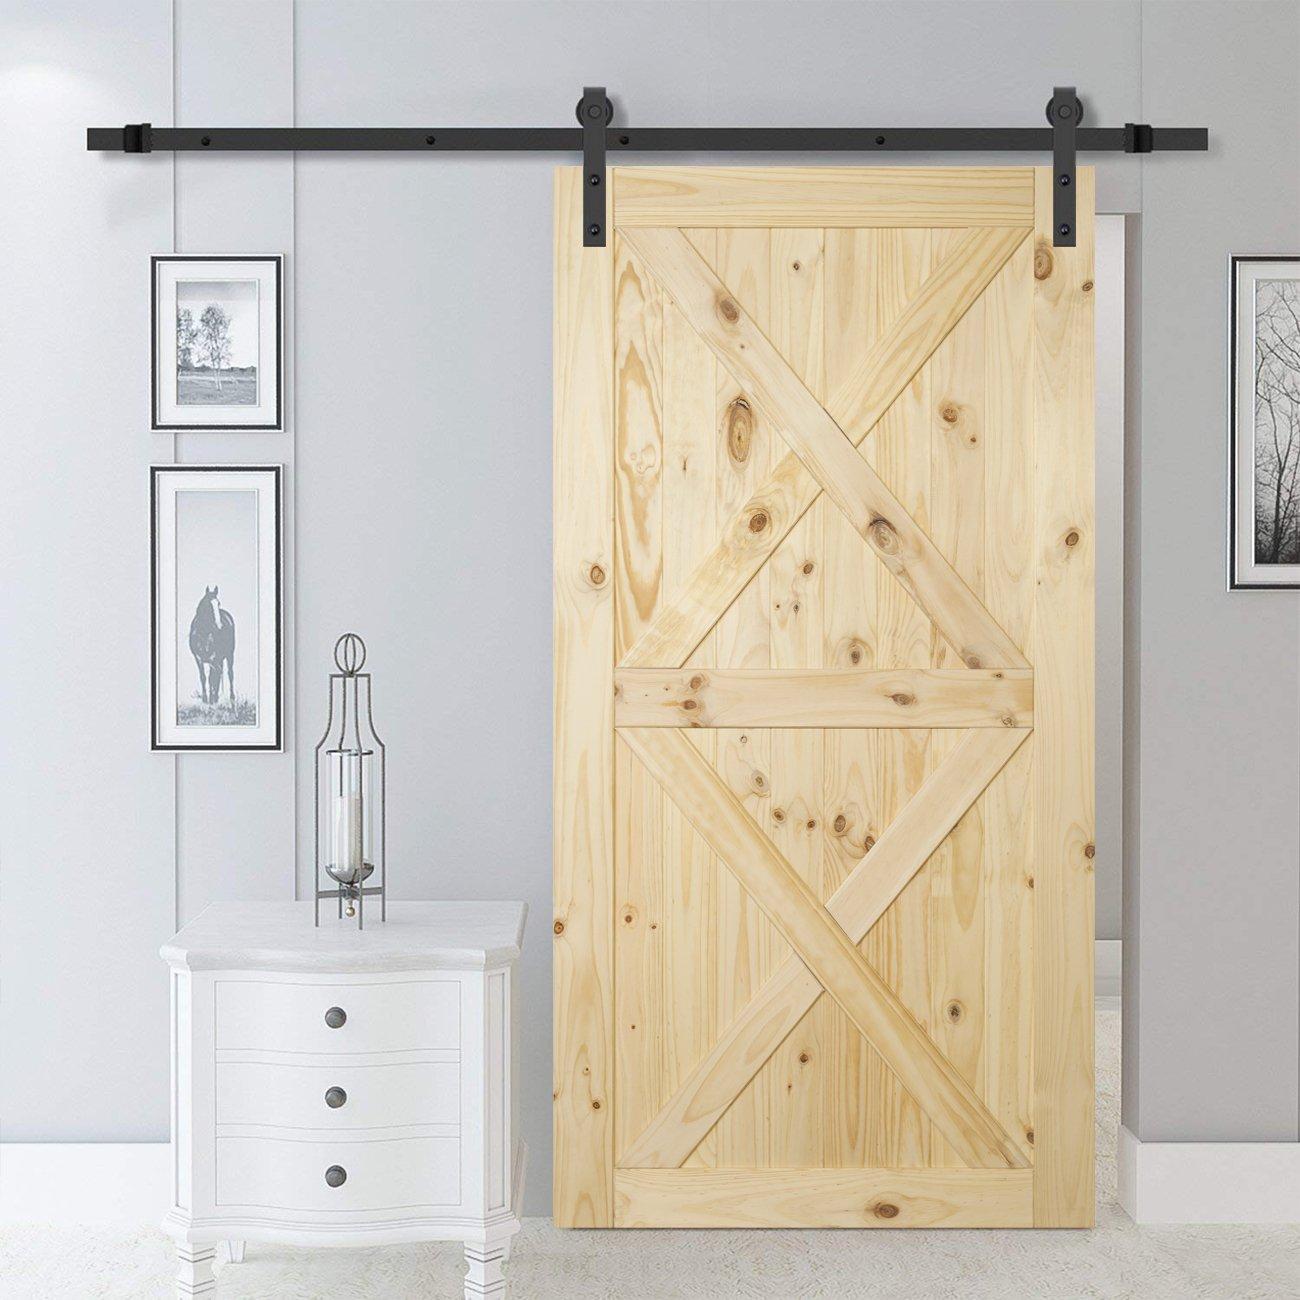 BELLEZE 42'' x 84'' inches Modern Sliding Barn Door Natural Wood Pine Unfinished Single Door, Double X